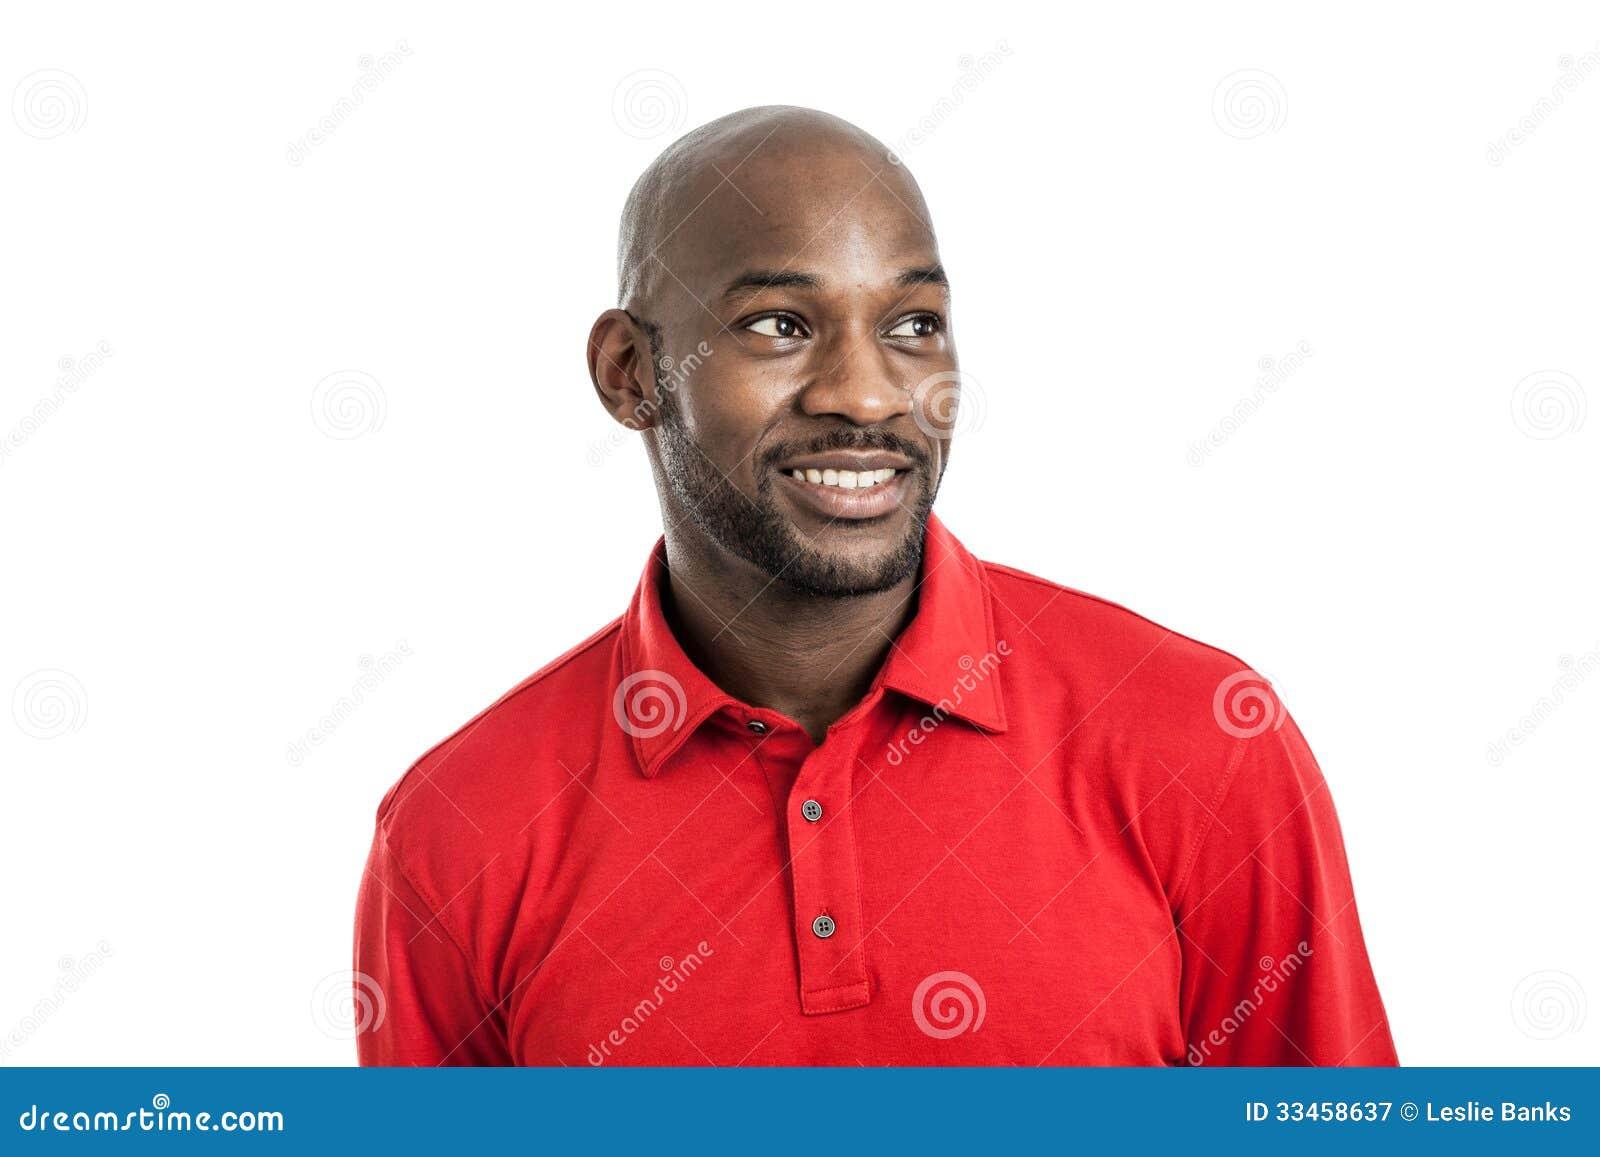 Black man pics free